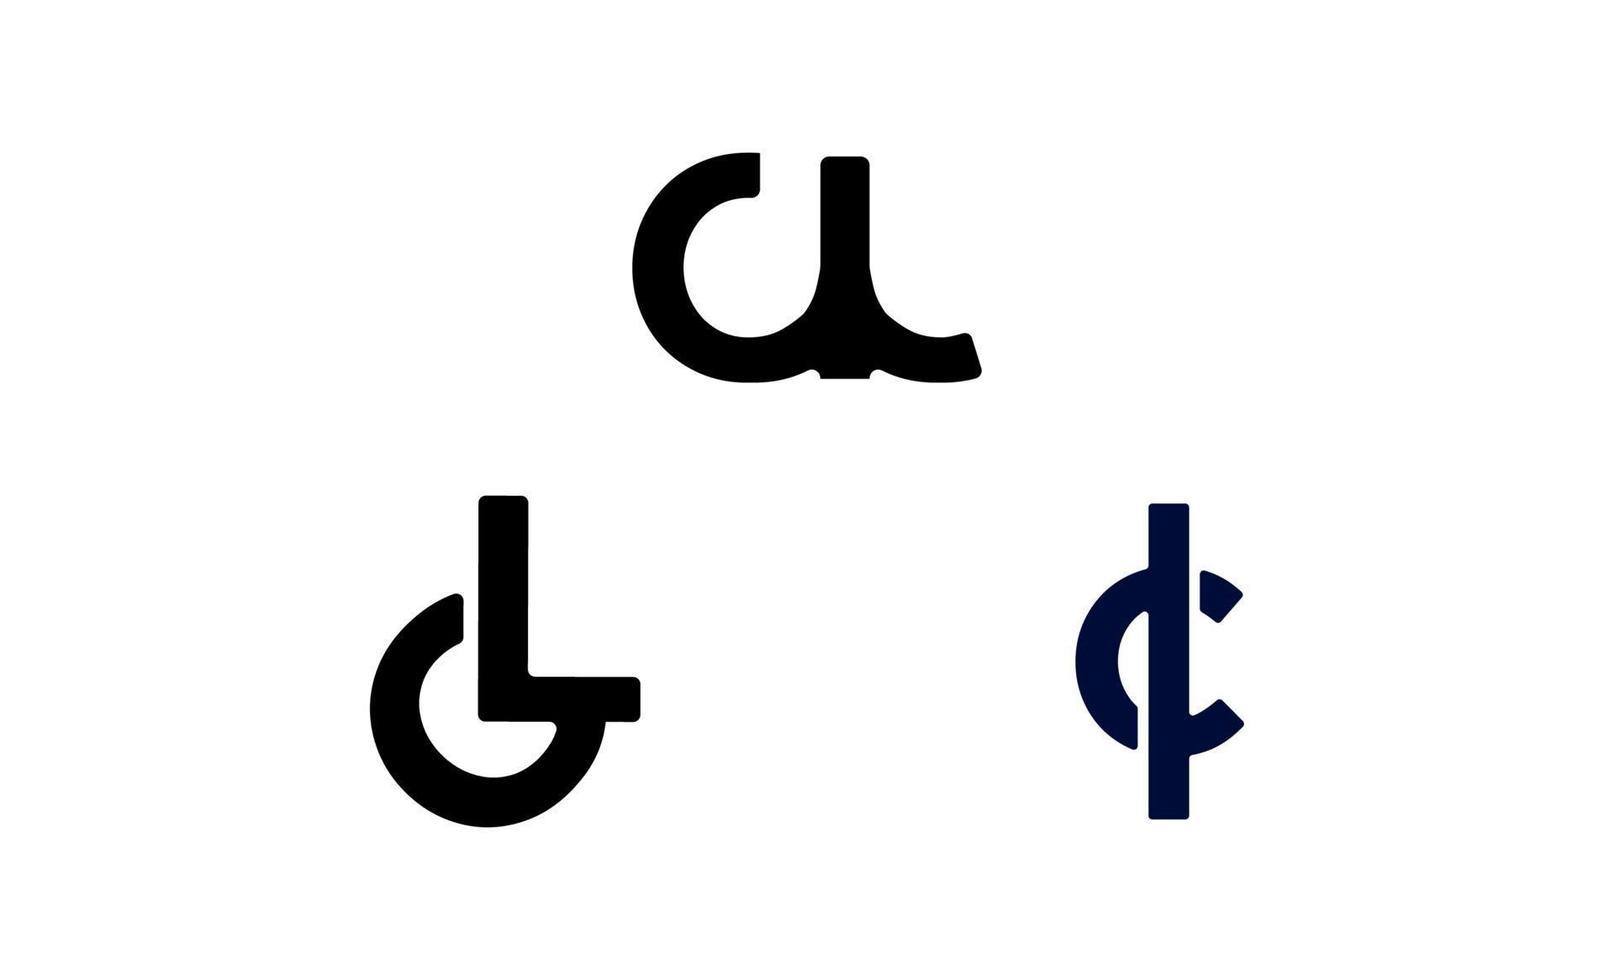 Anfangsbuchstabe cl, lc Logo Design Vorlage Vektor